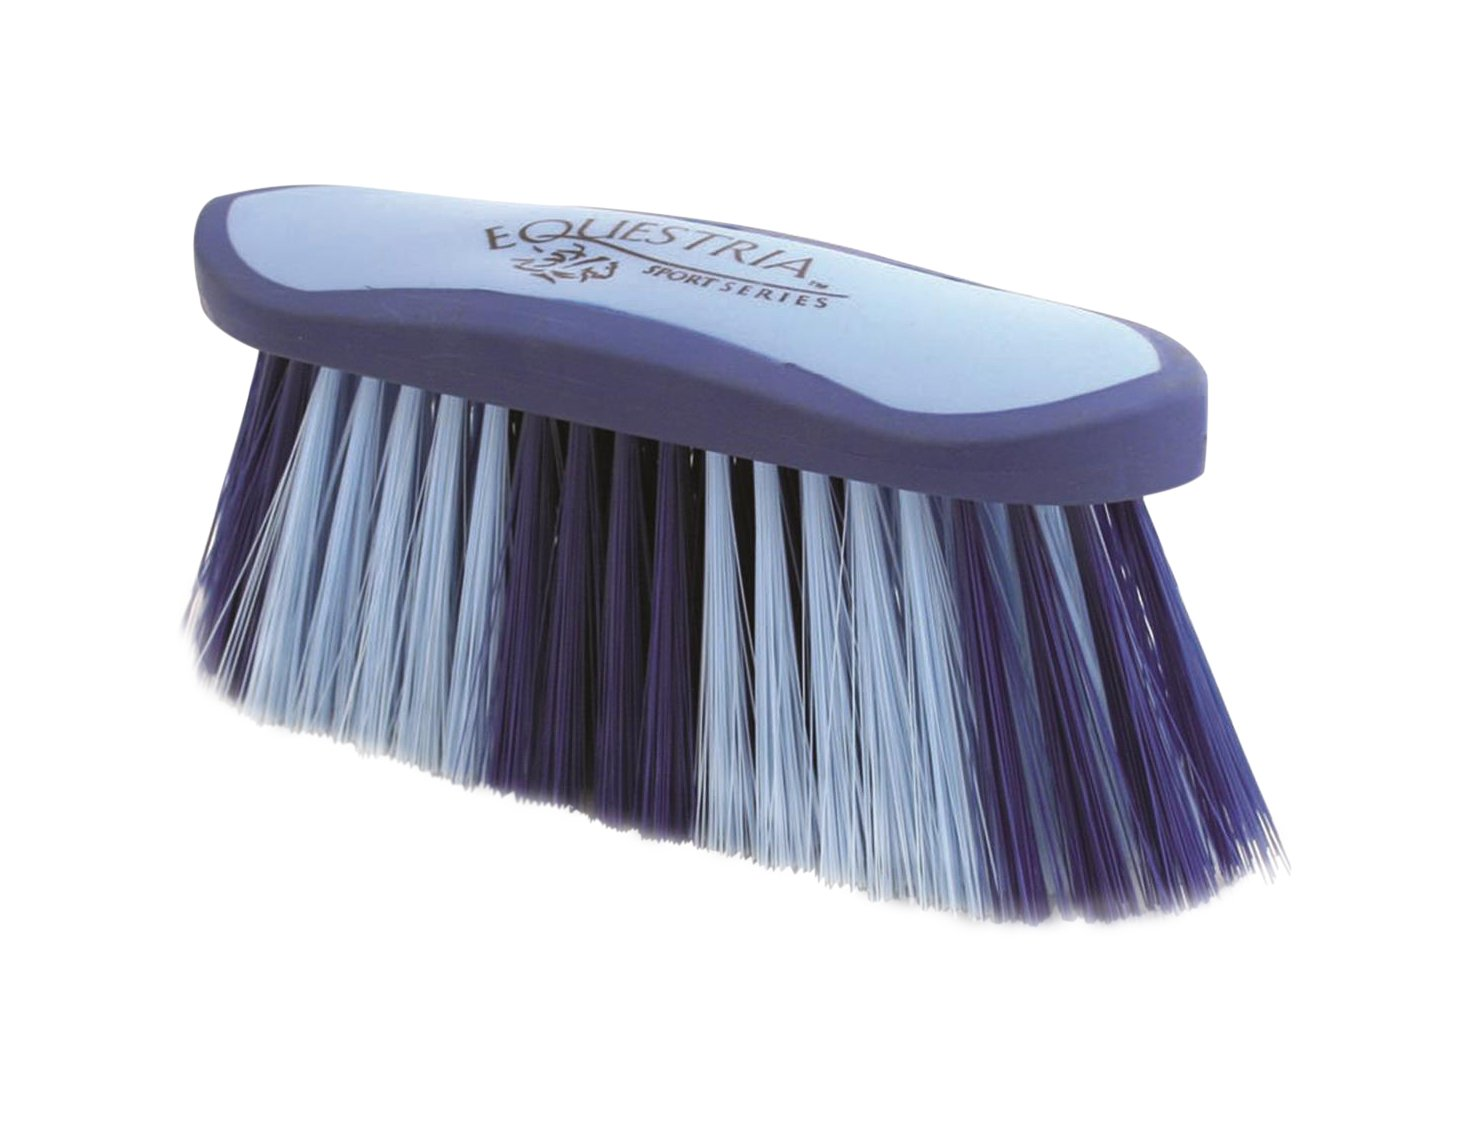 Decker Company 020140 Equestria 运动装饰化妆刷,蓝色,8 英寸